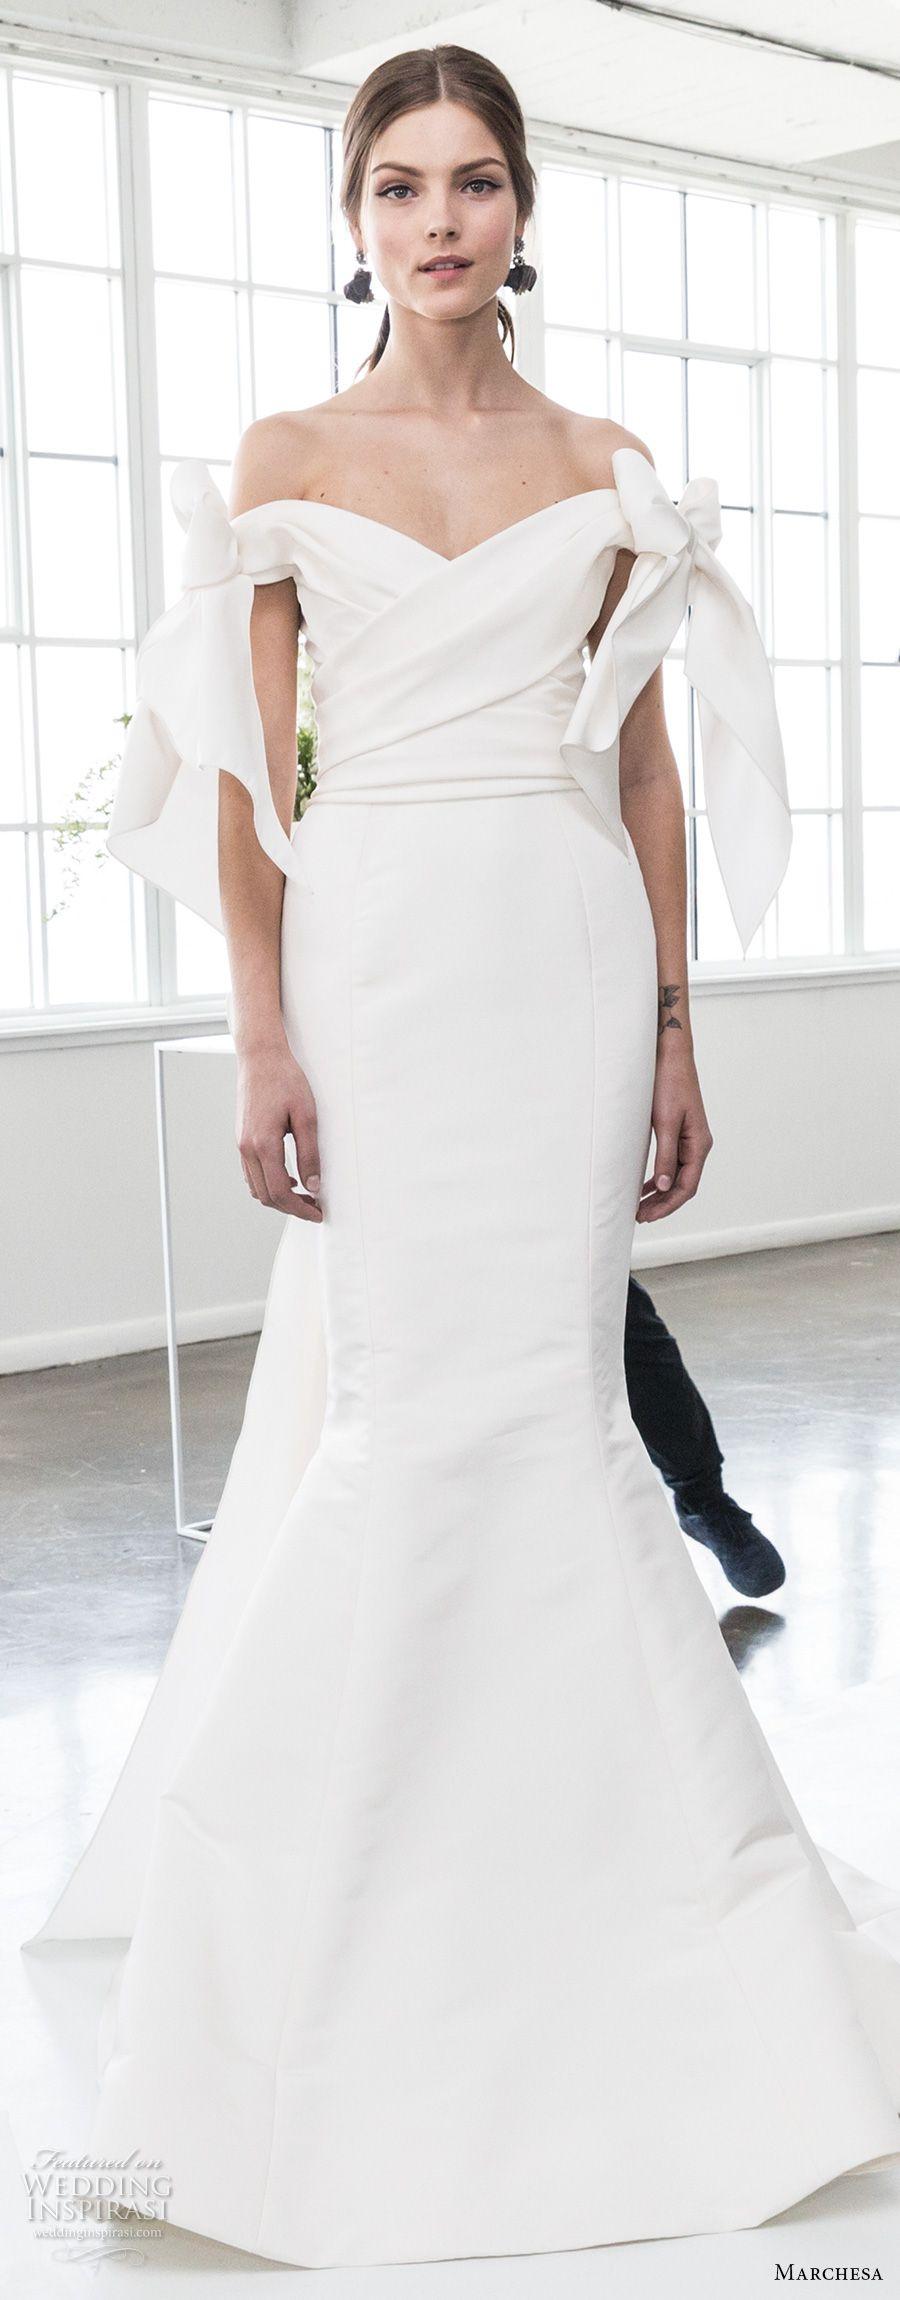 Marchesa Bridal Spring 2018 Wedding Dresses — New York Bridal ...